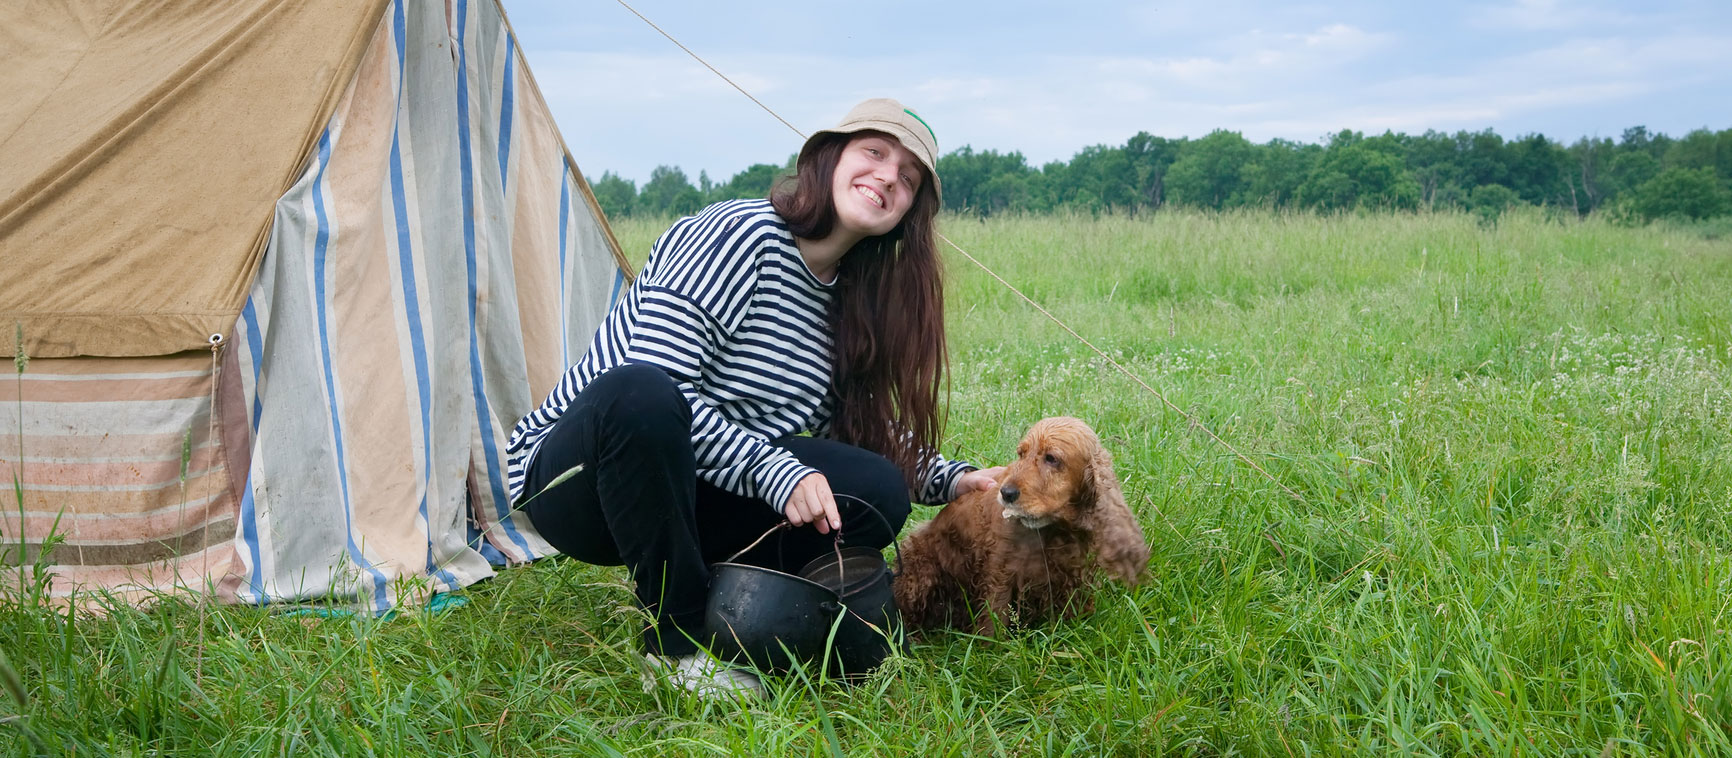 italian girl with his brown dog